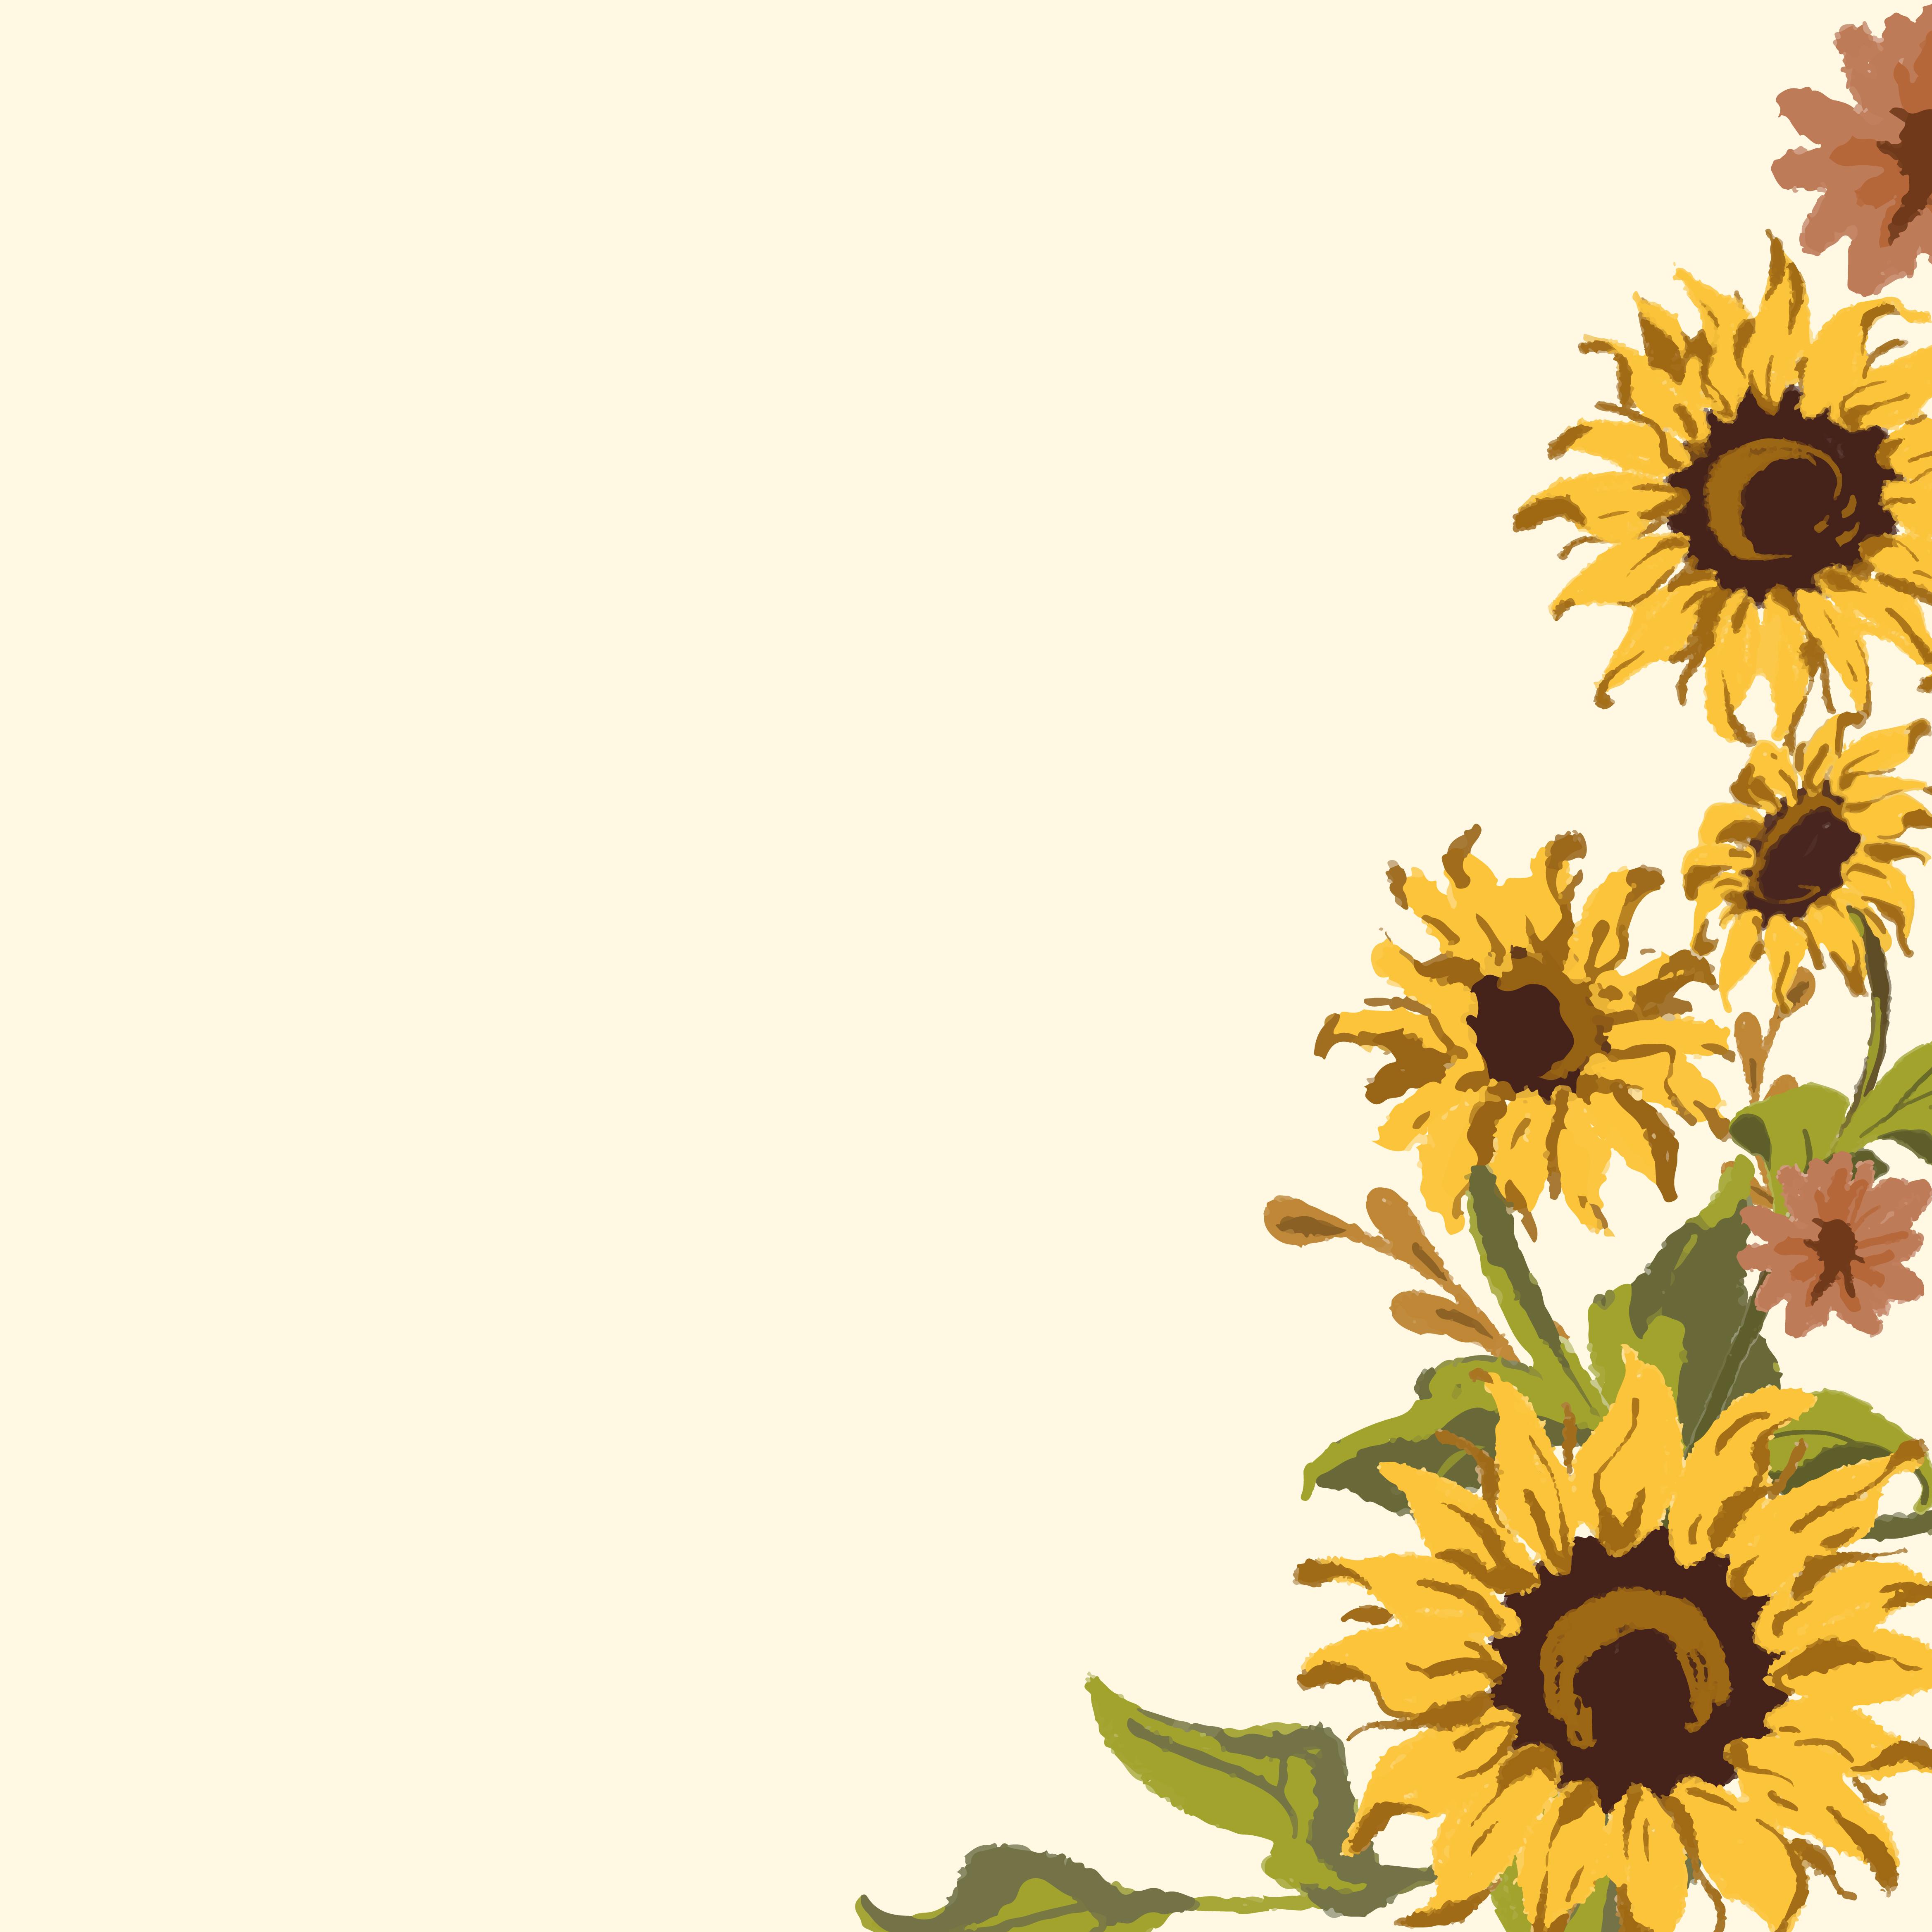 Panoramic Wallpaper Fall Sunflower Wallpaper Free Vector Art 141 Free Downloads